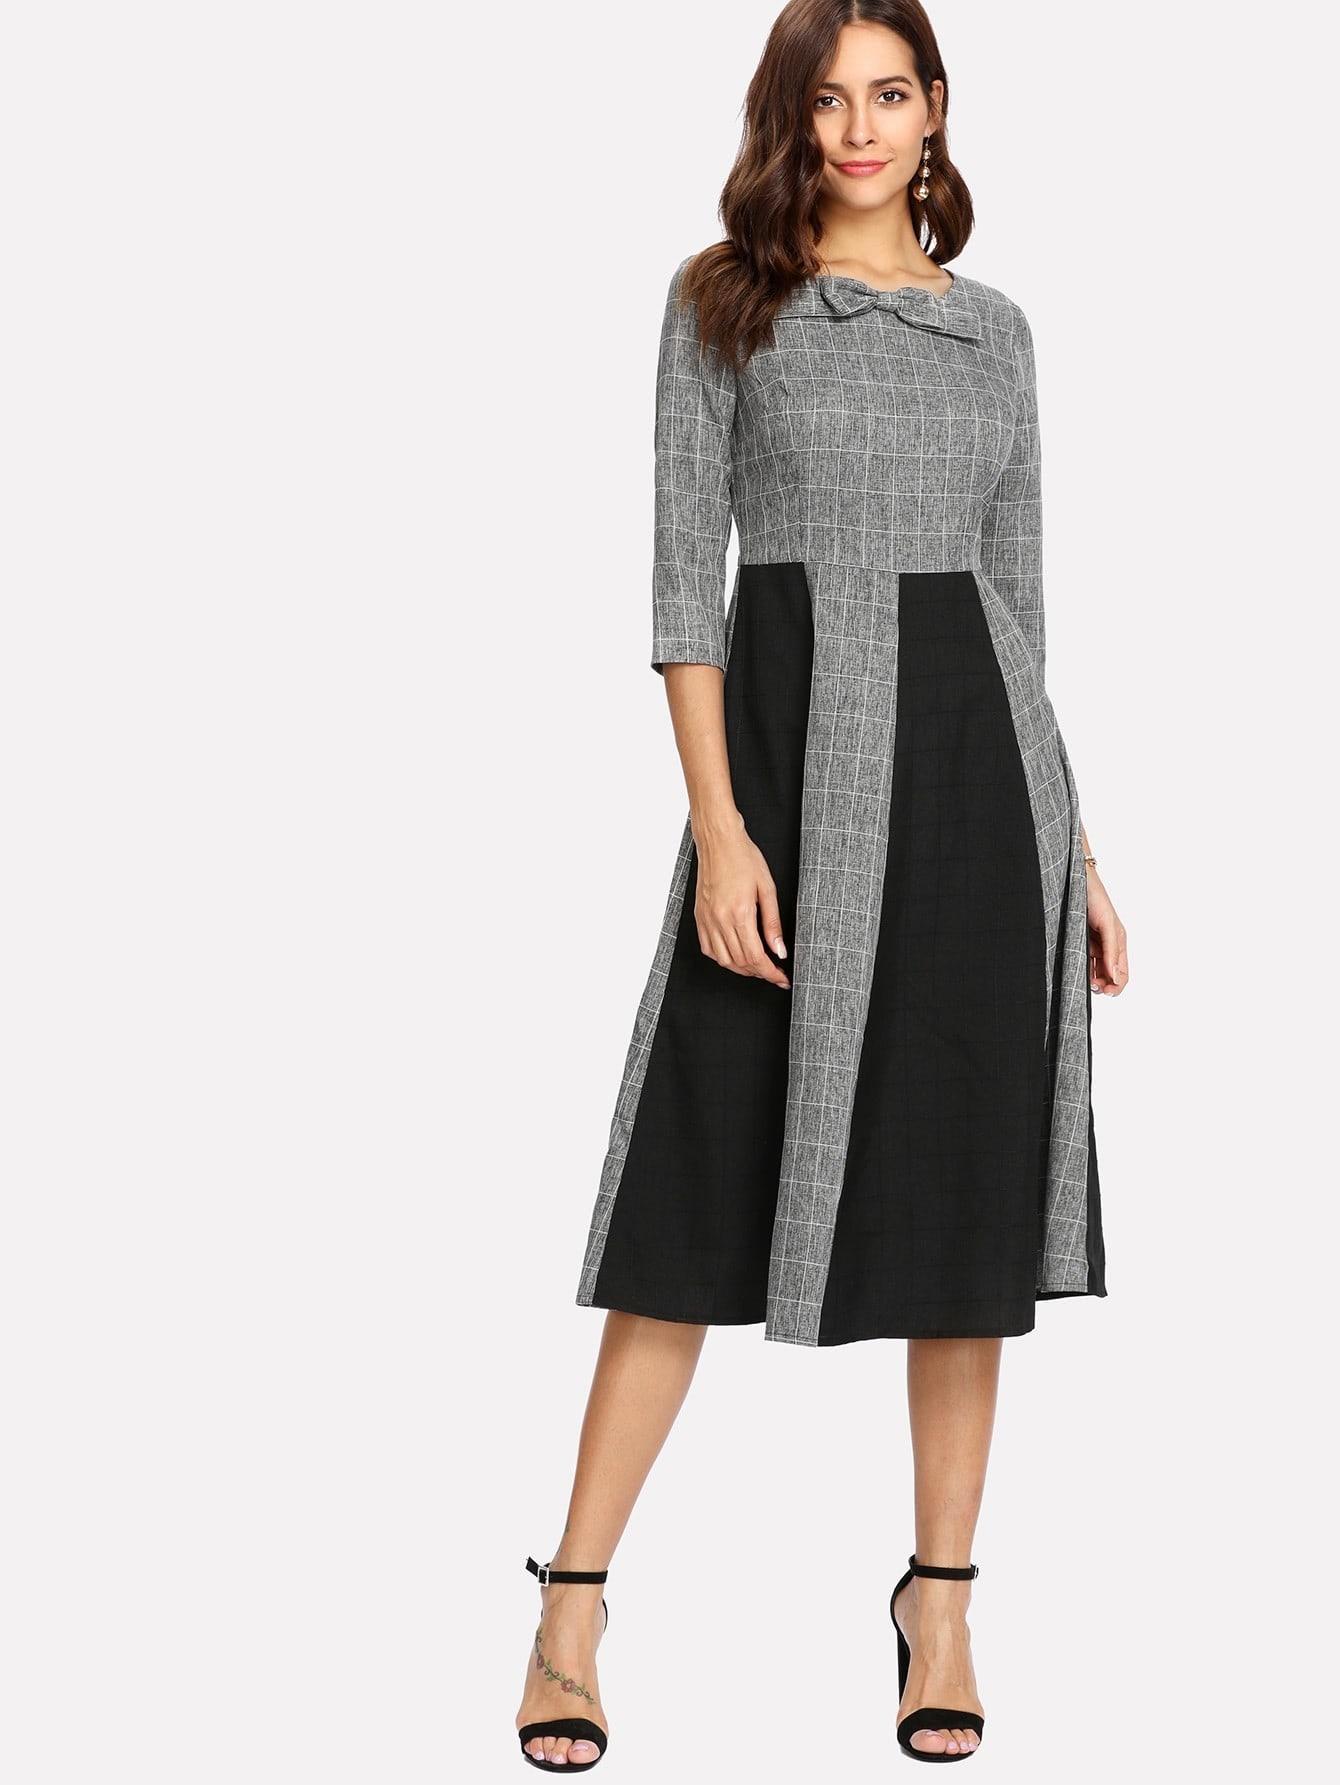 Bow Neck Contrast Panel Grid Dress